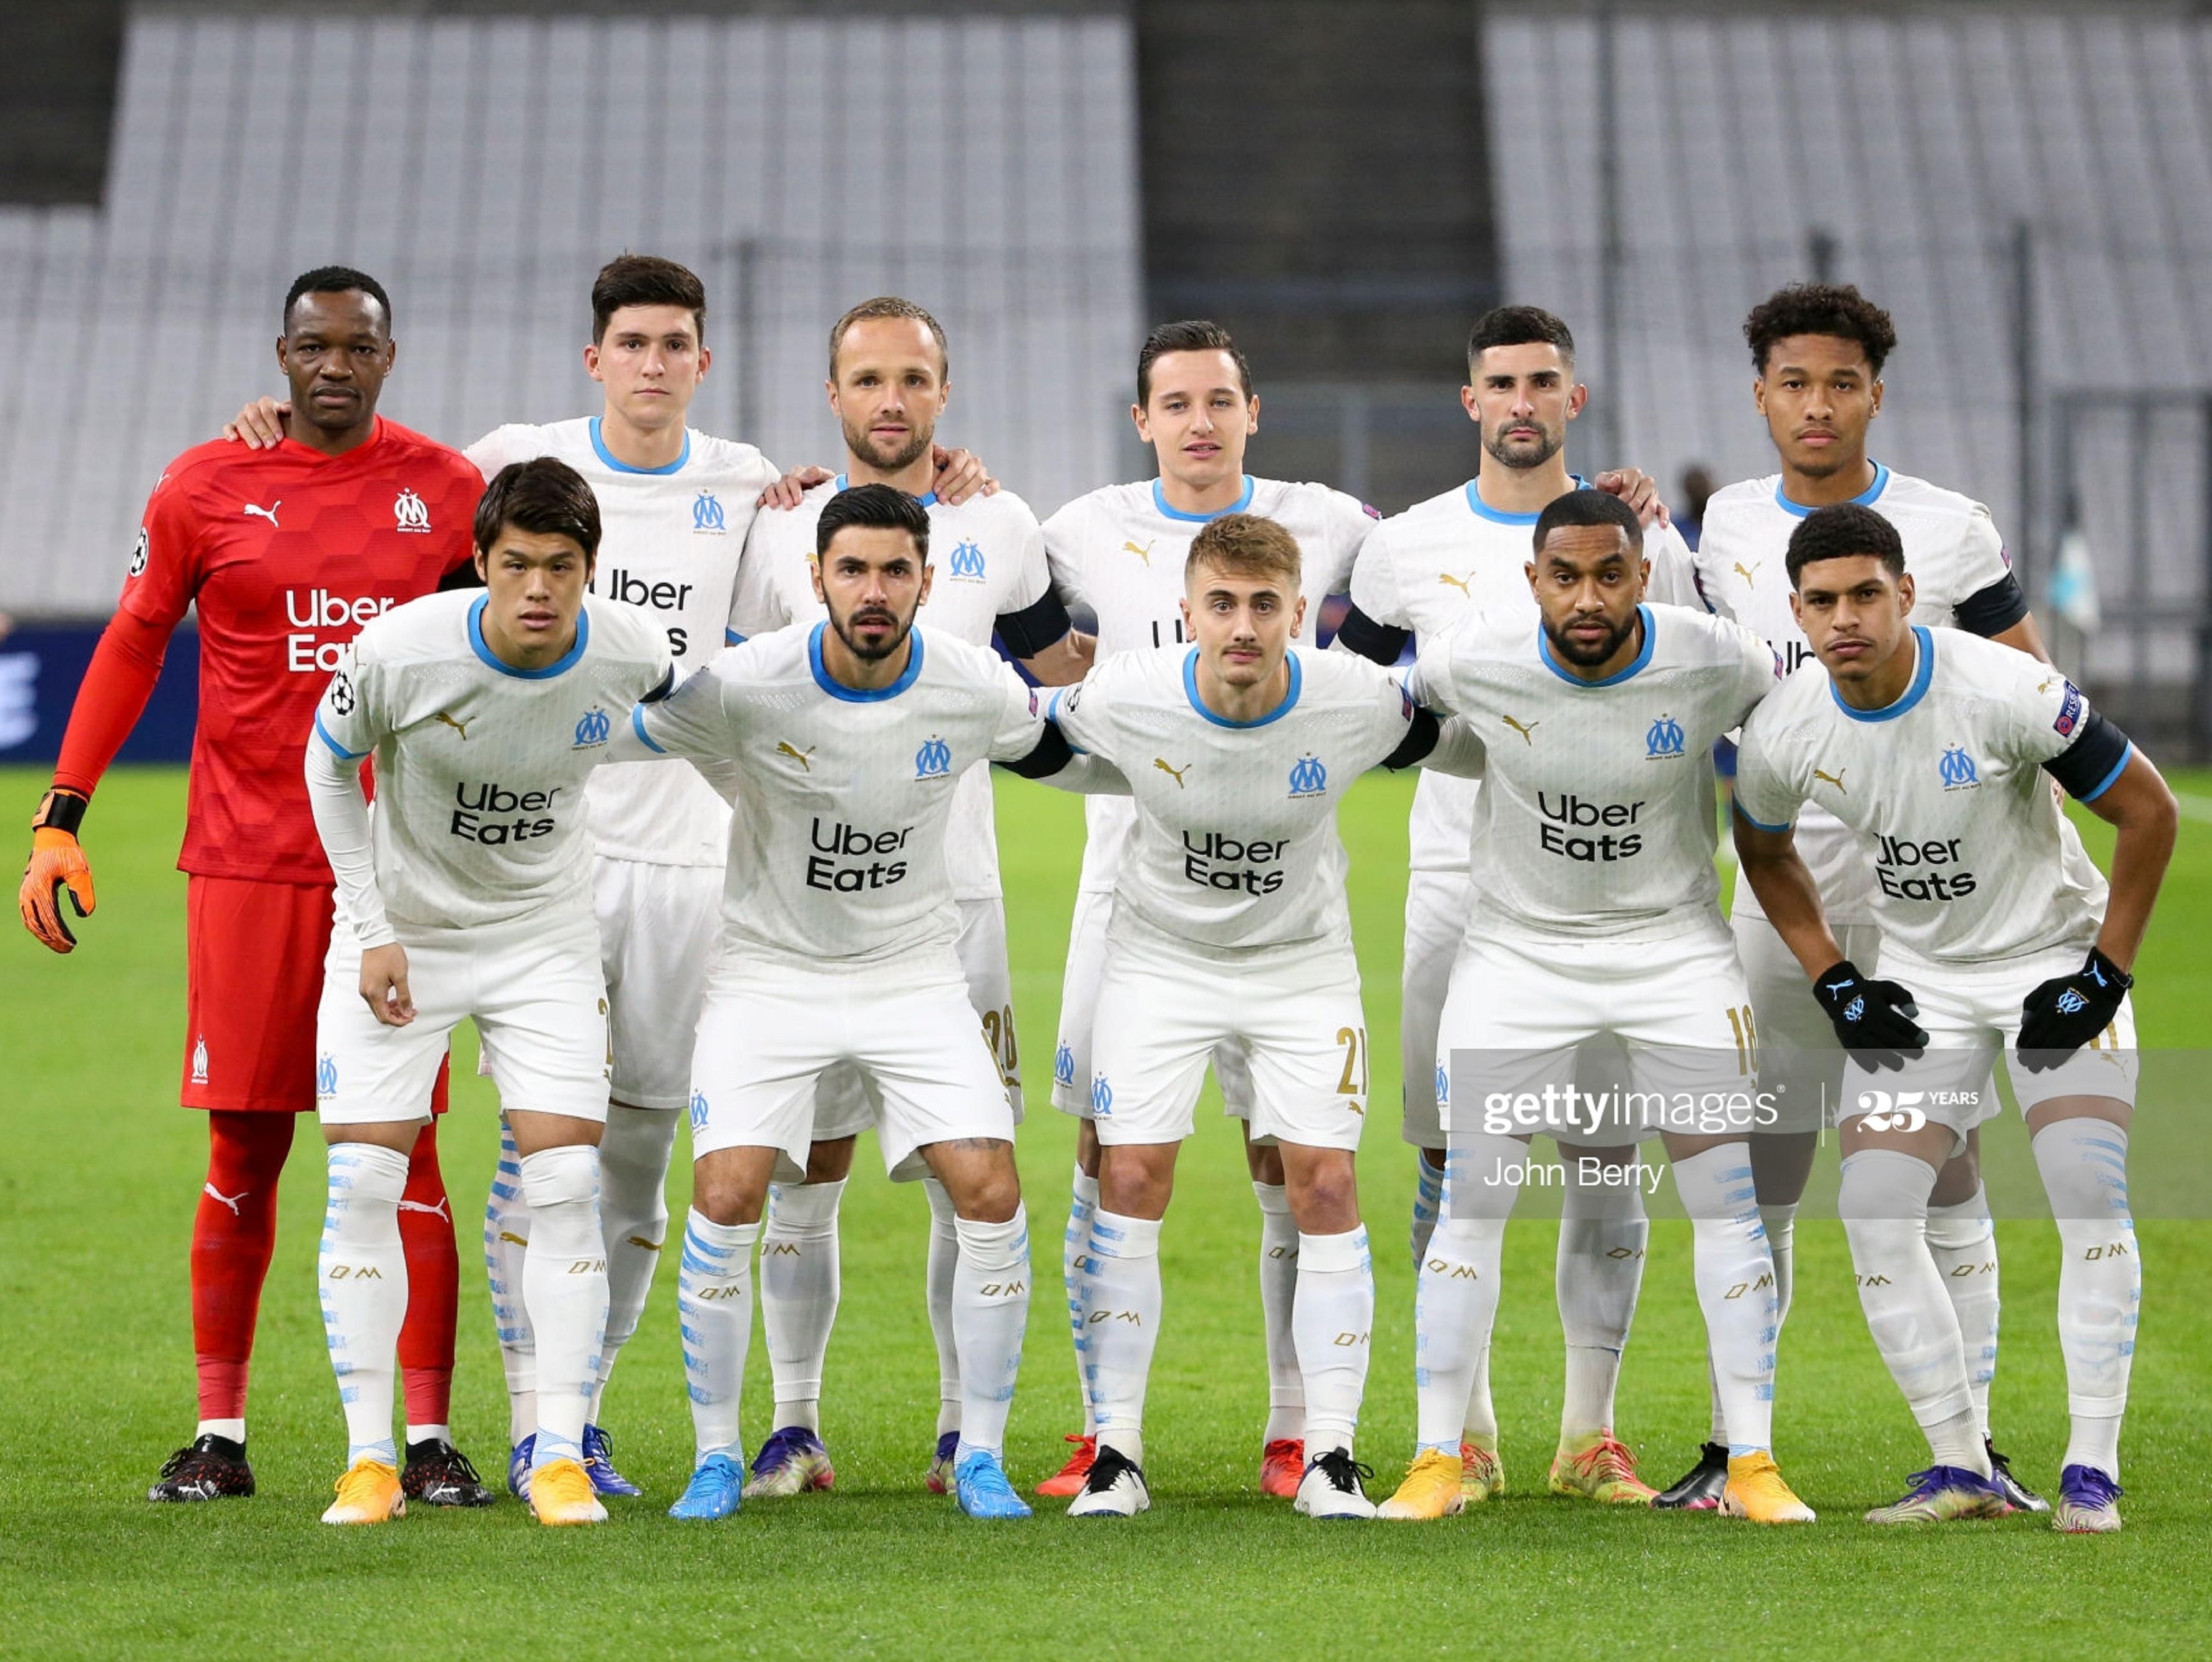 Марсель (Франция) - Порту (Португалия) 0:2